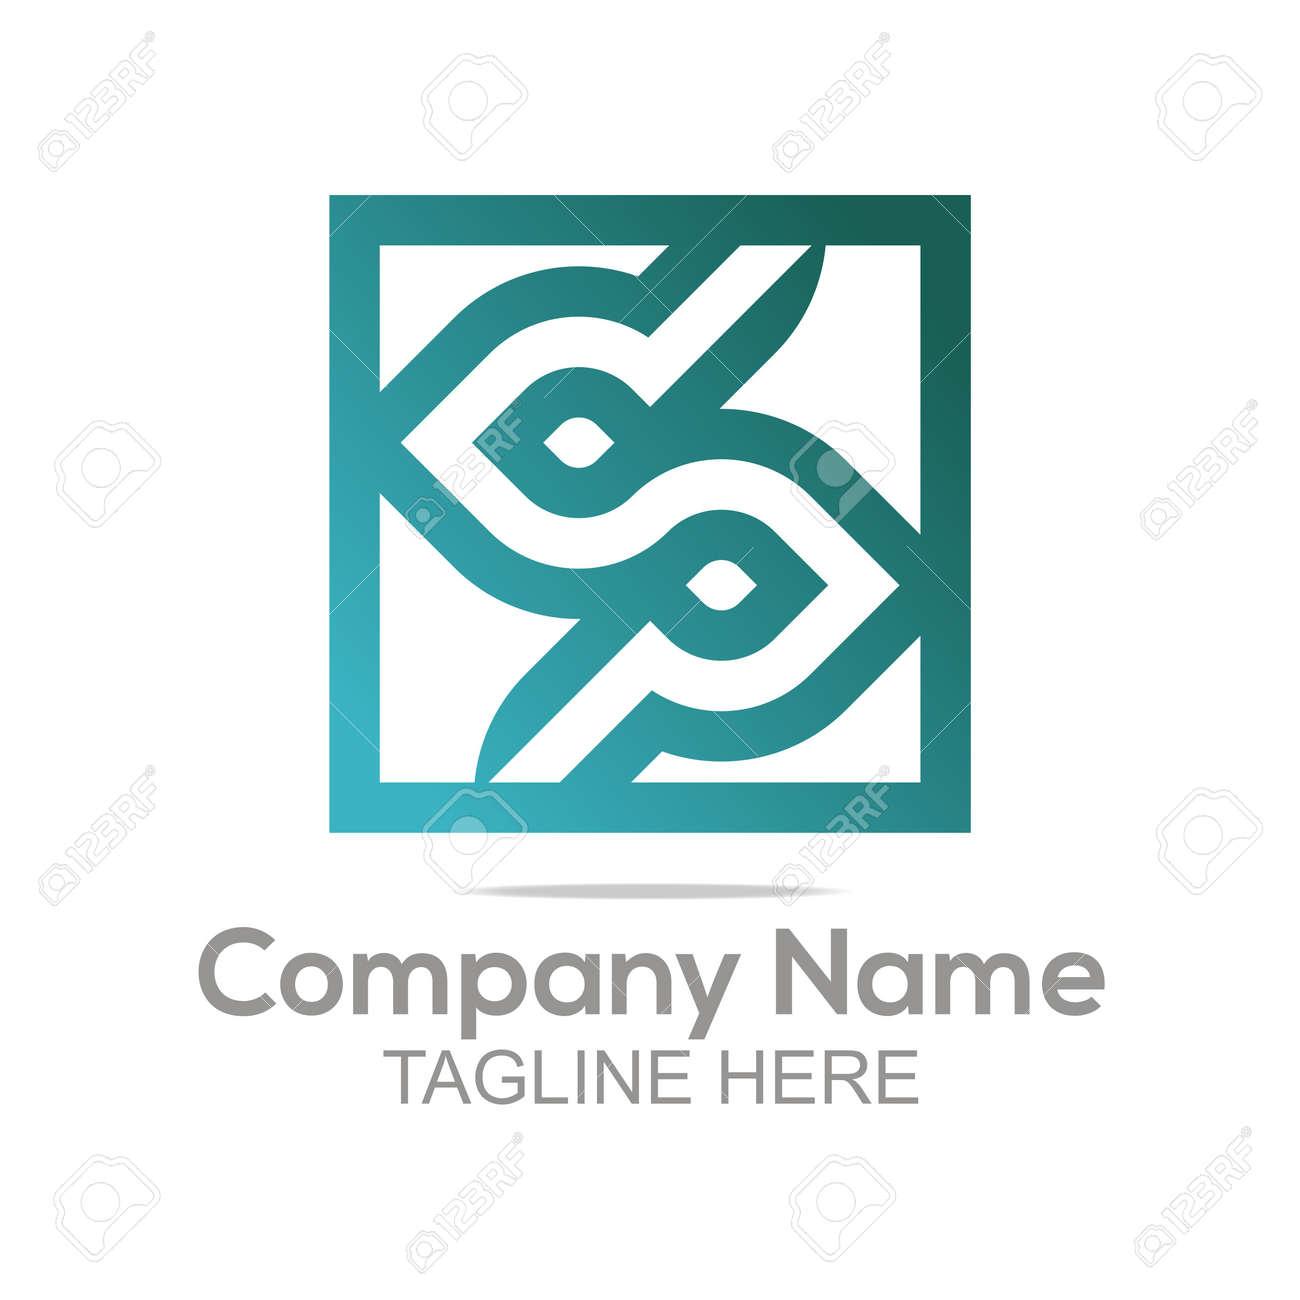 Logo design company name letter s infinity connecting symbol logo design company name letter s infinity connecting symbol icon abstract vector stock vector 45283478 buycottarizona